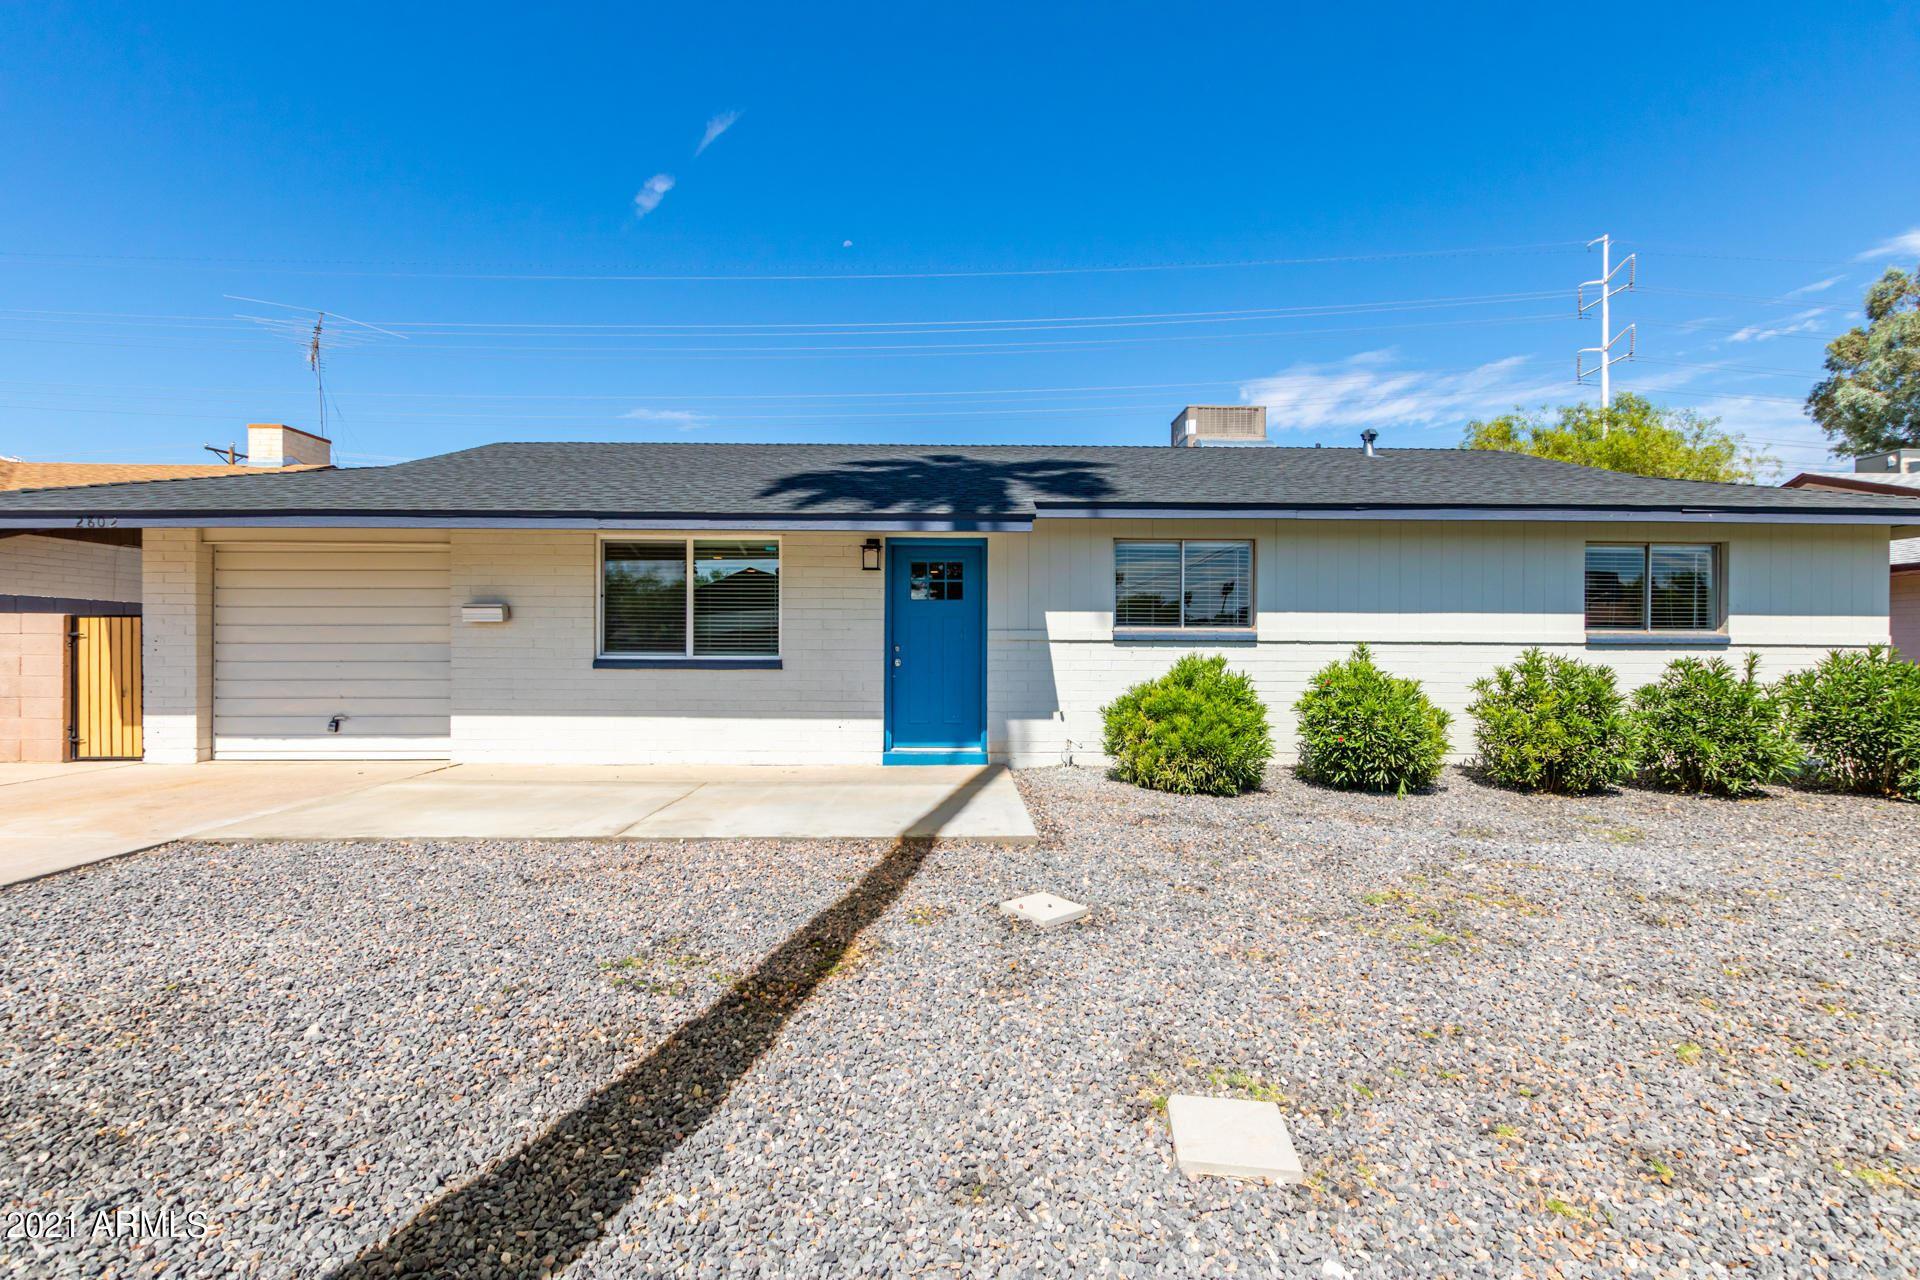 Photo of 2802 S DROMEDARY Drive, Tempe, AZ 85282 (MLS # 6272678)